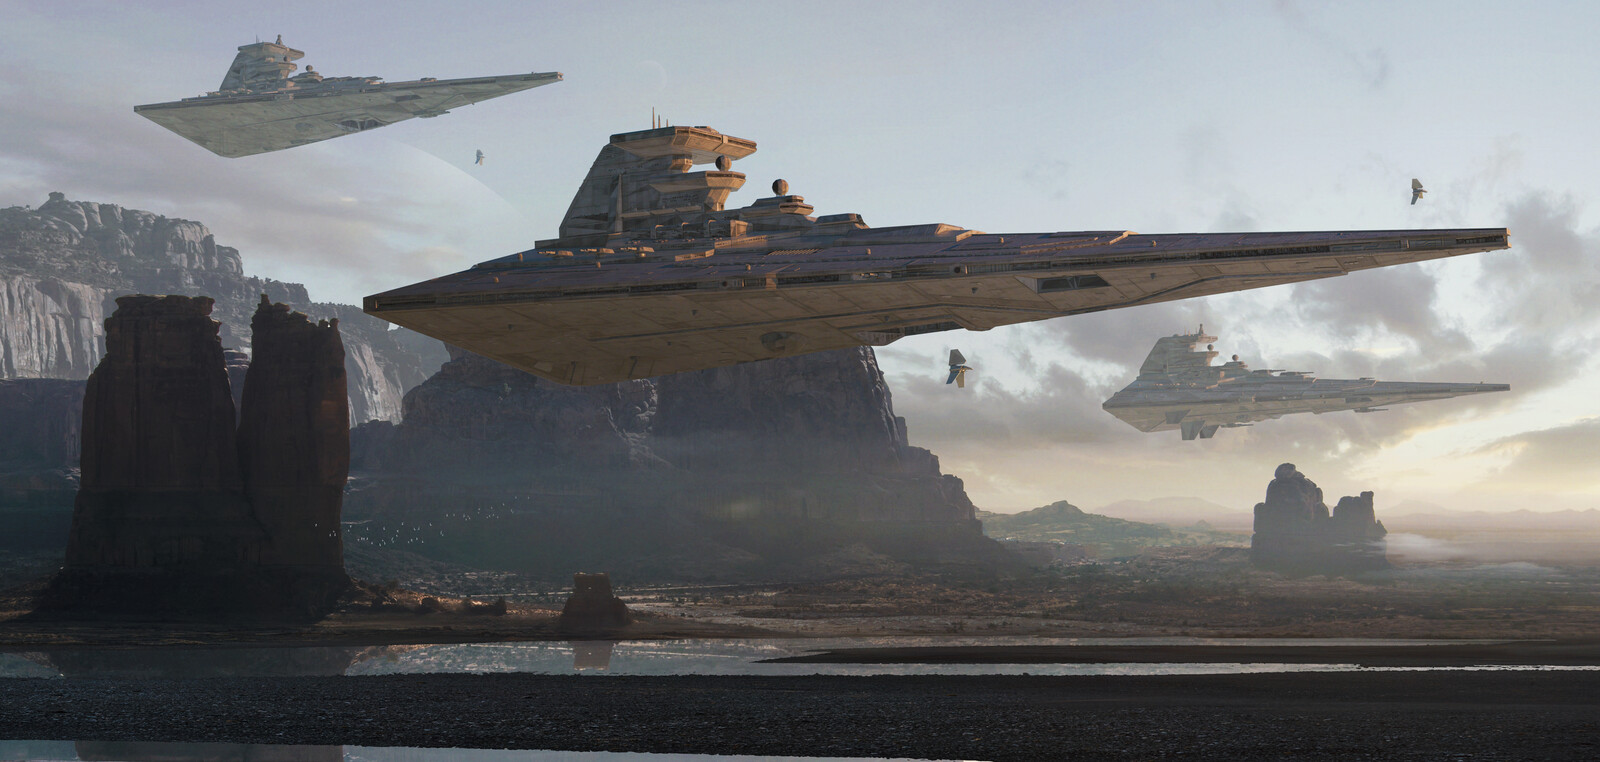 Star wars fan art. Quick concepts